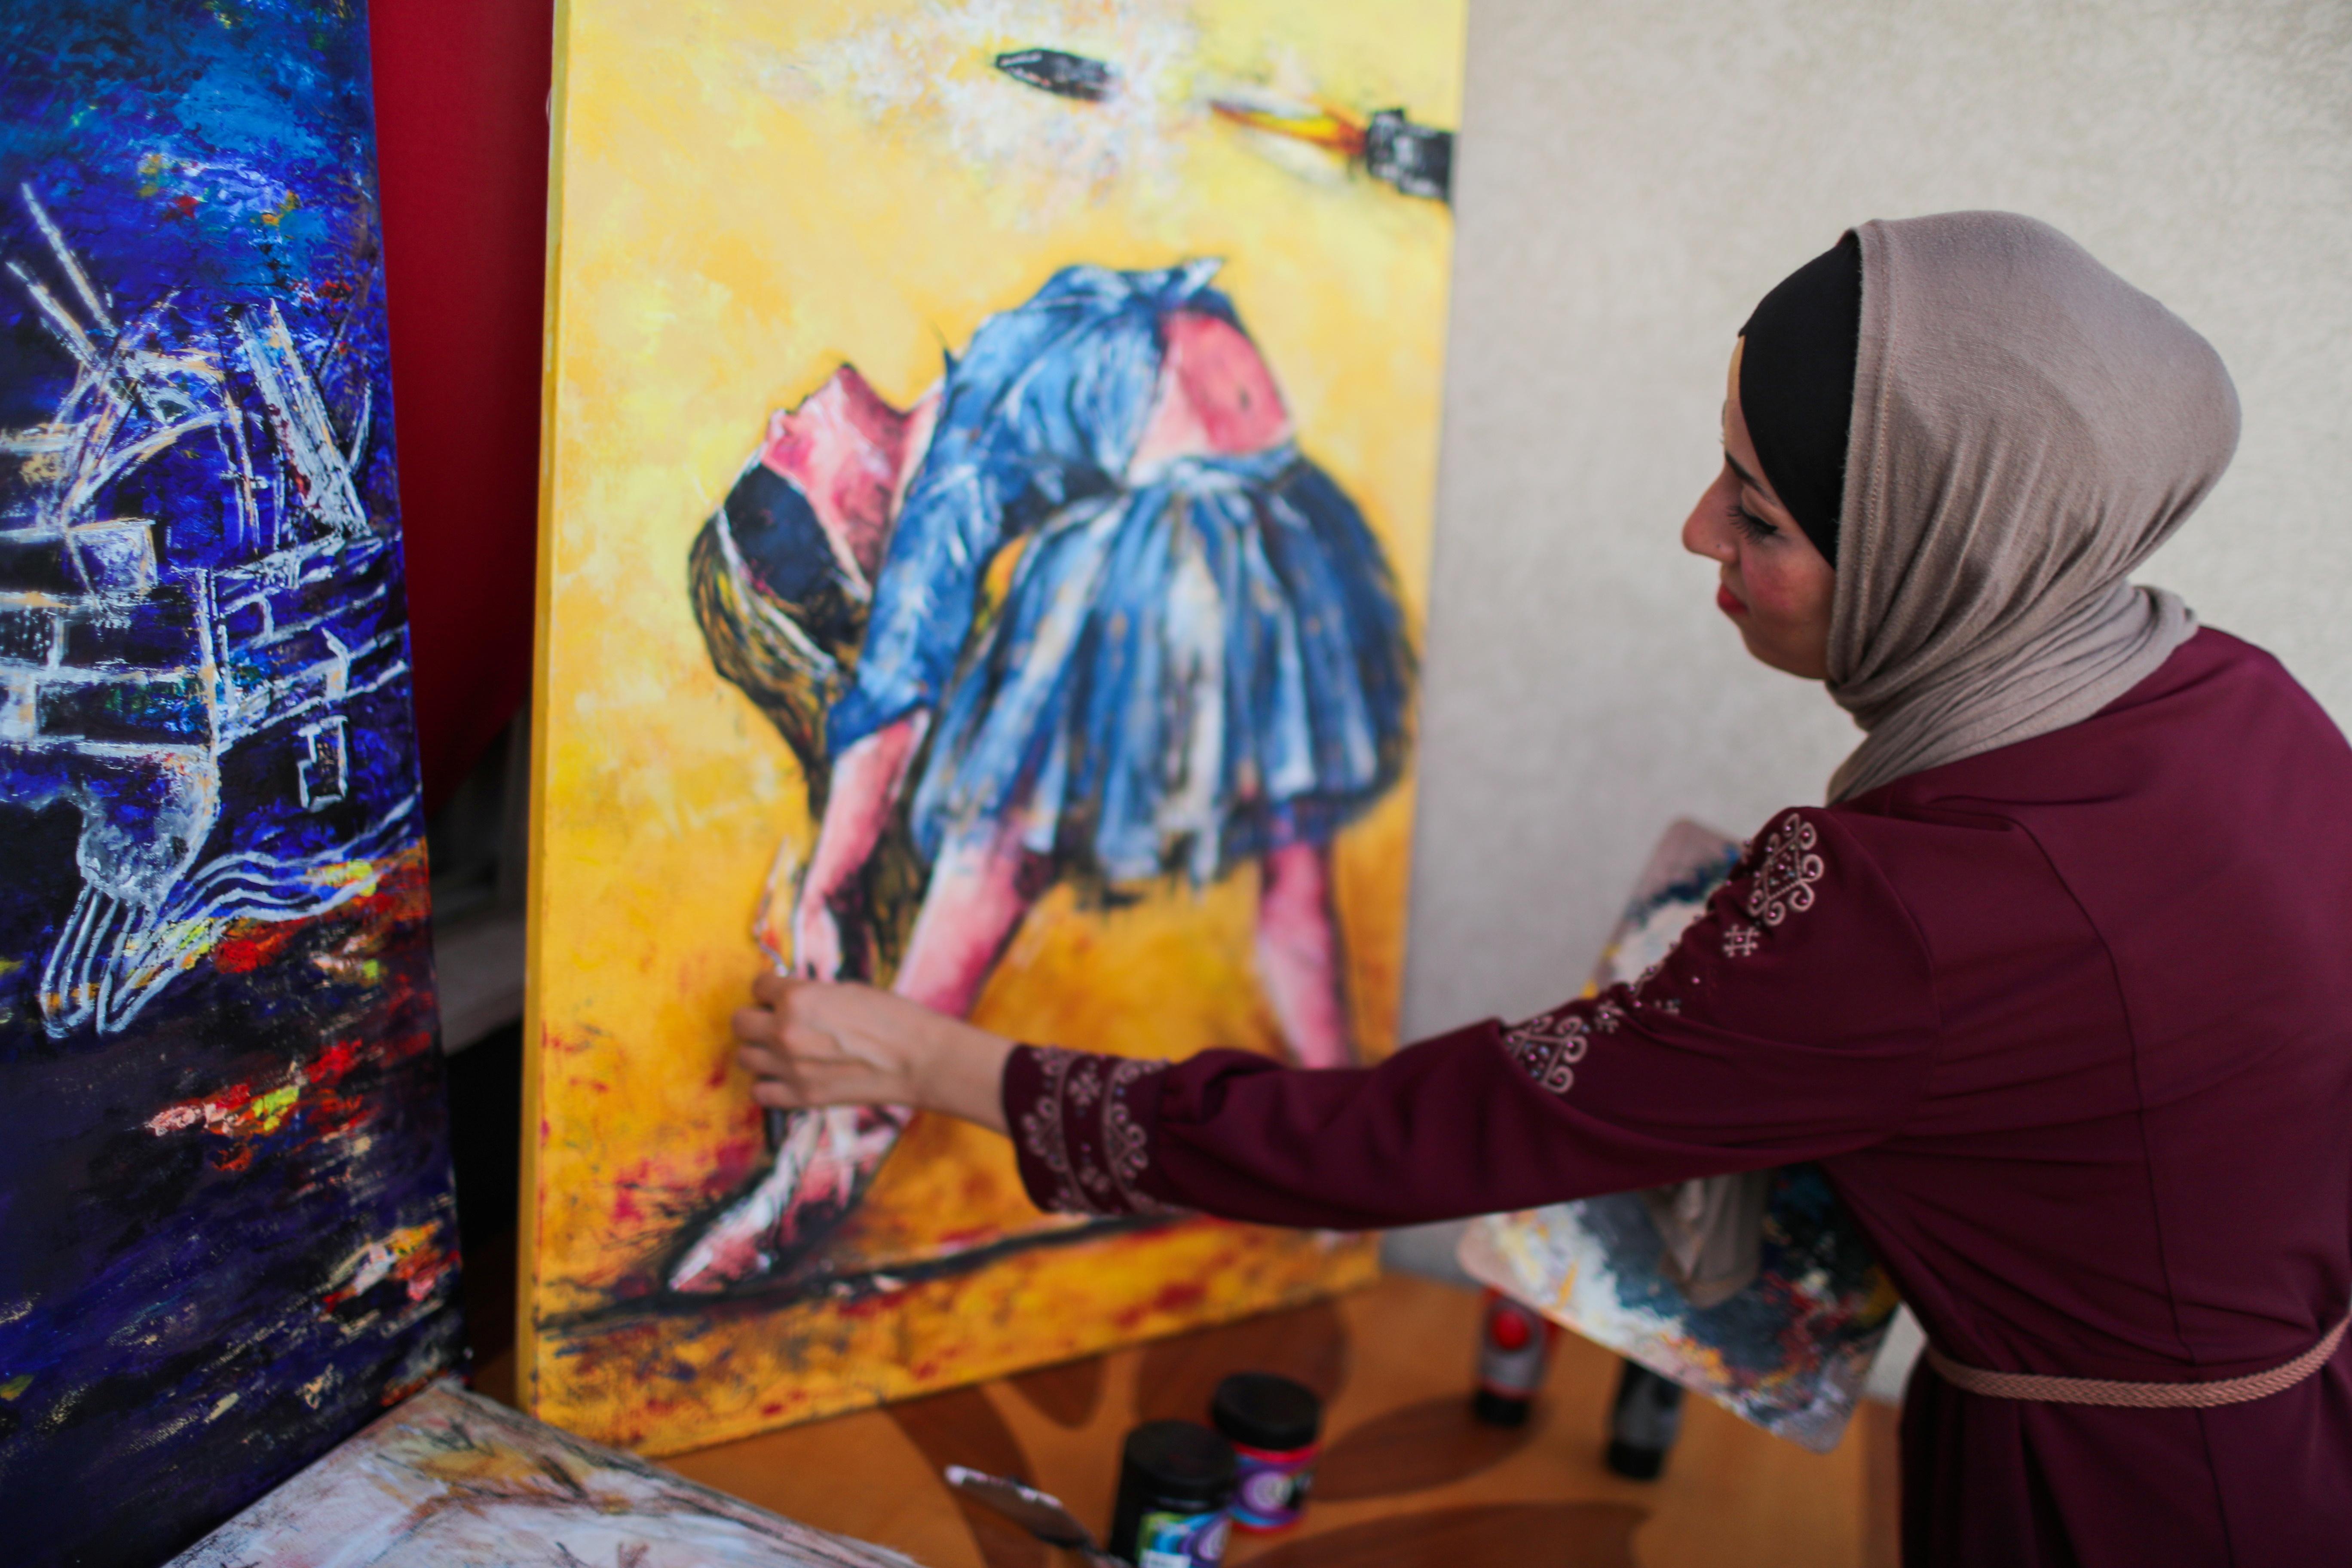 A Palestinian artist, Abeer Jibril, works on ballet paintings at her home in Gaza City, September 8, 2021. Picture taken September 8, 2021. REUTERS/Mohammed Salem